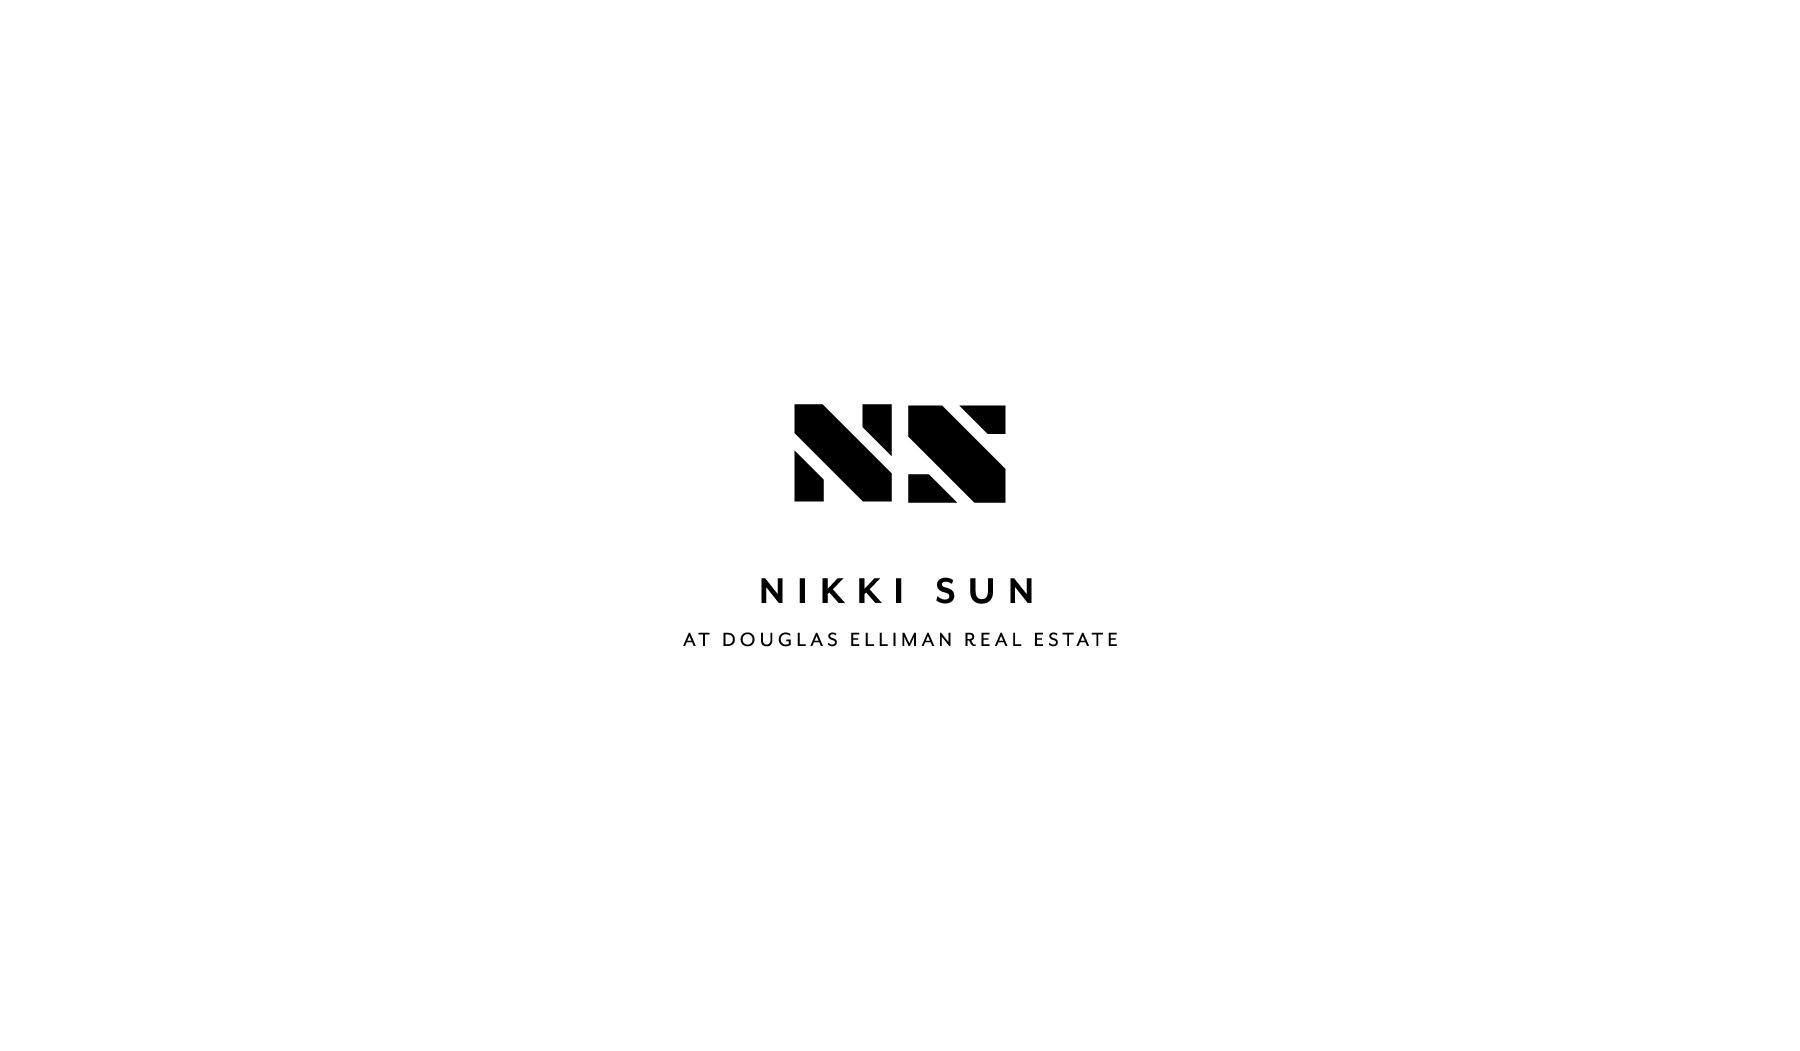 logo compilation-23.jpg